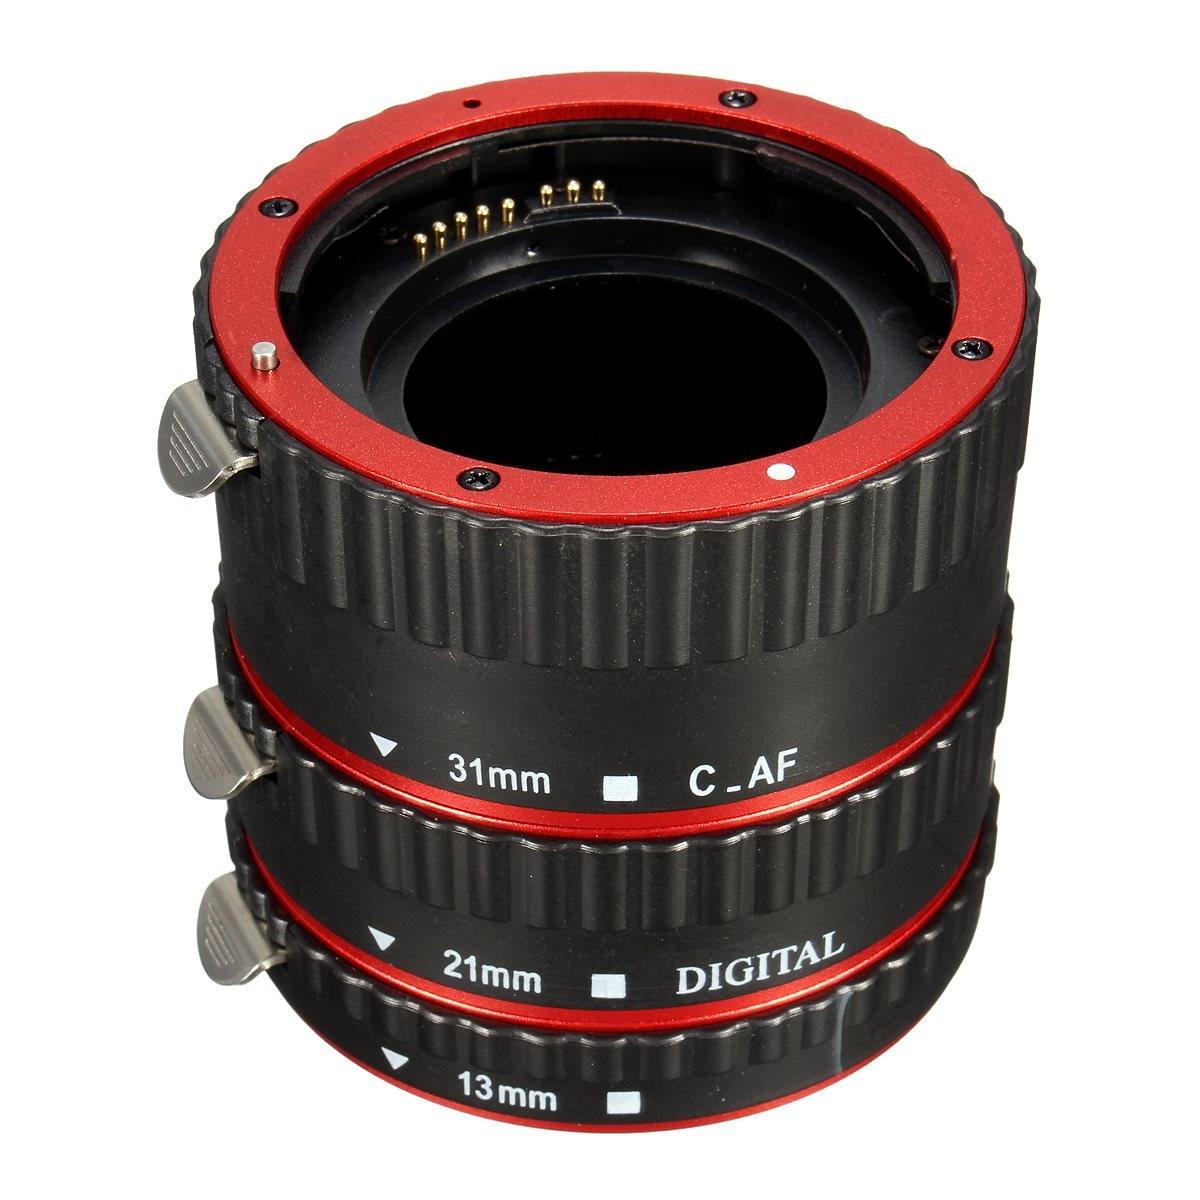 Metal Mount Auto AF Macro Extension Tube/Ring for Kenko for Canon EF-S Len T5i T4i T3i T2i 6D 7D 60D 70D 100D 550D 600D<br><br>Aliexpress